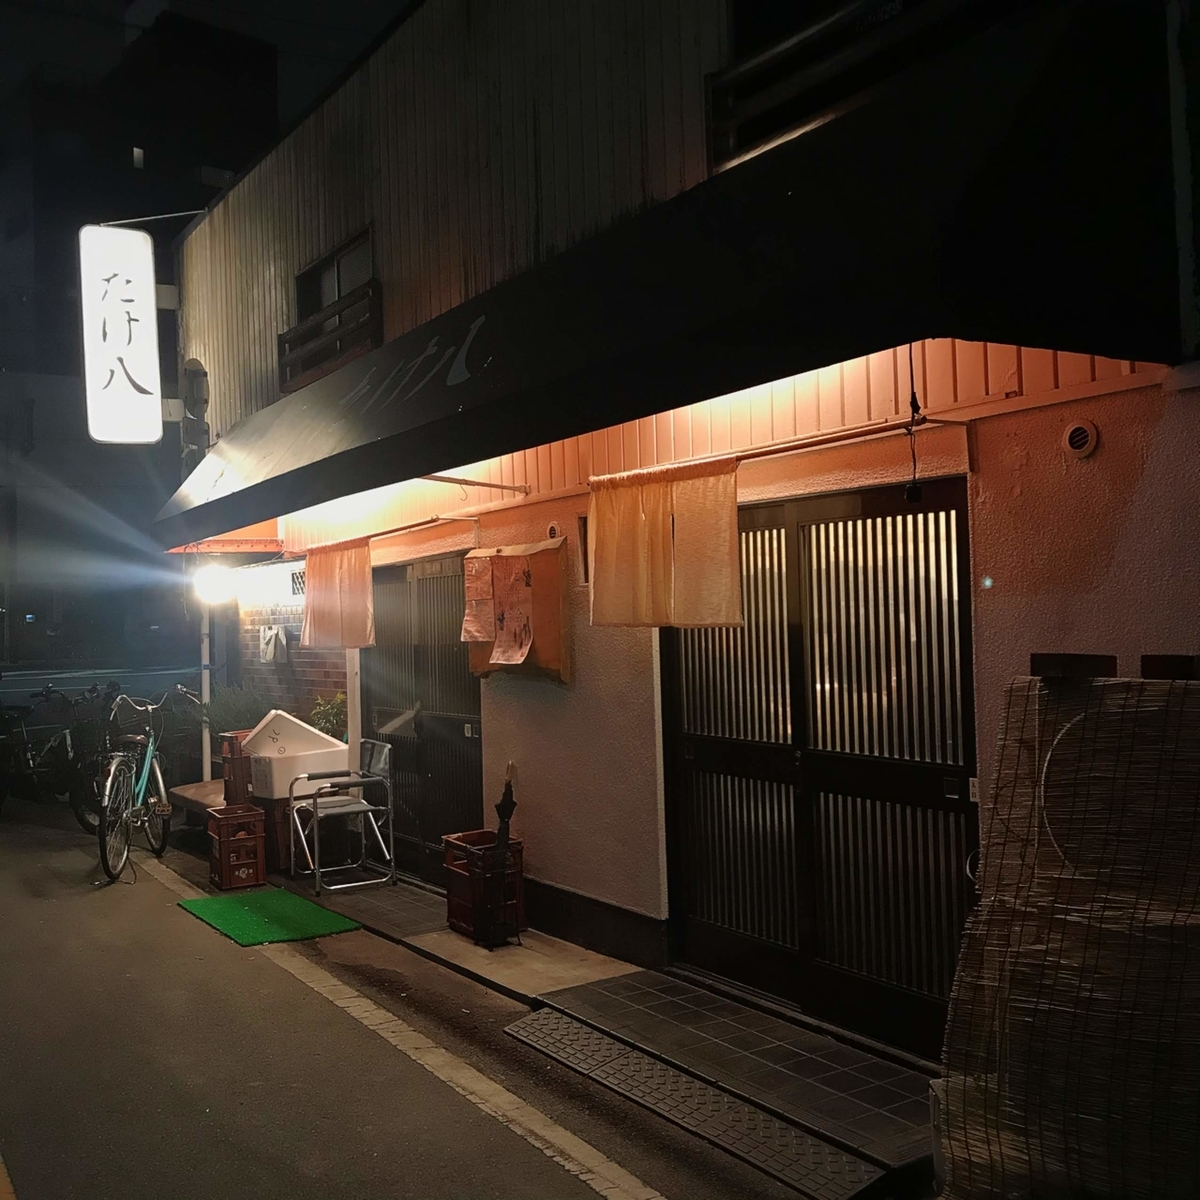 f:id:kanagurume:20200316113823j:plain